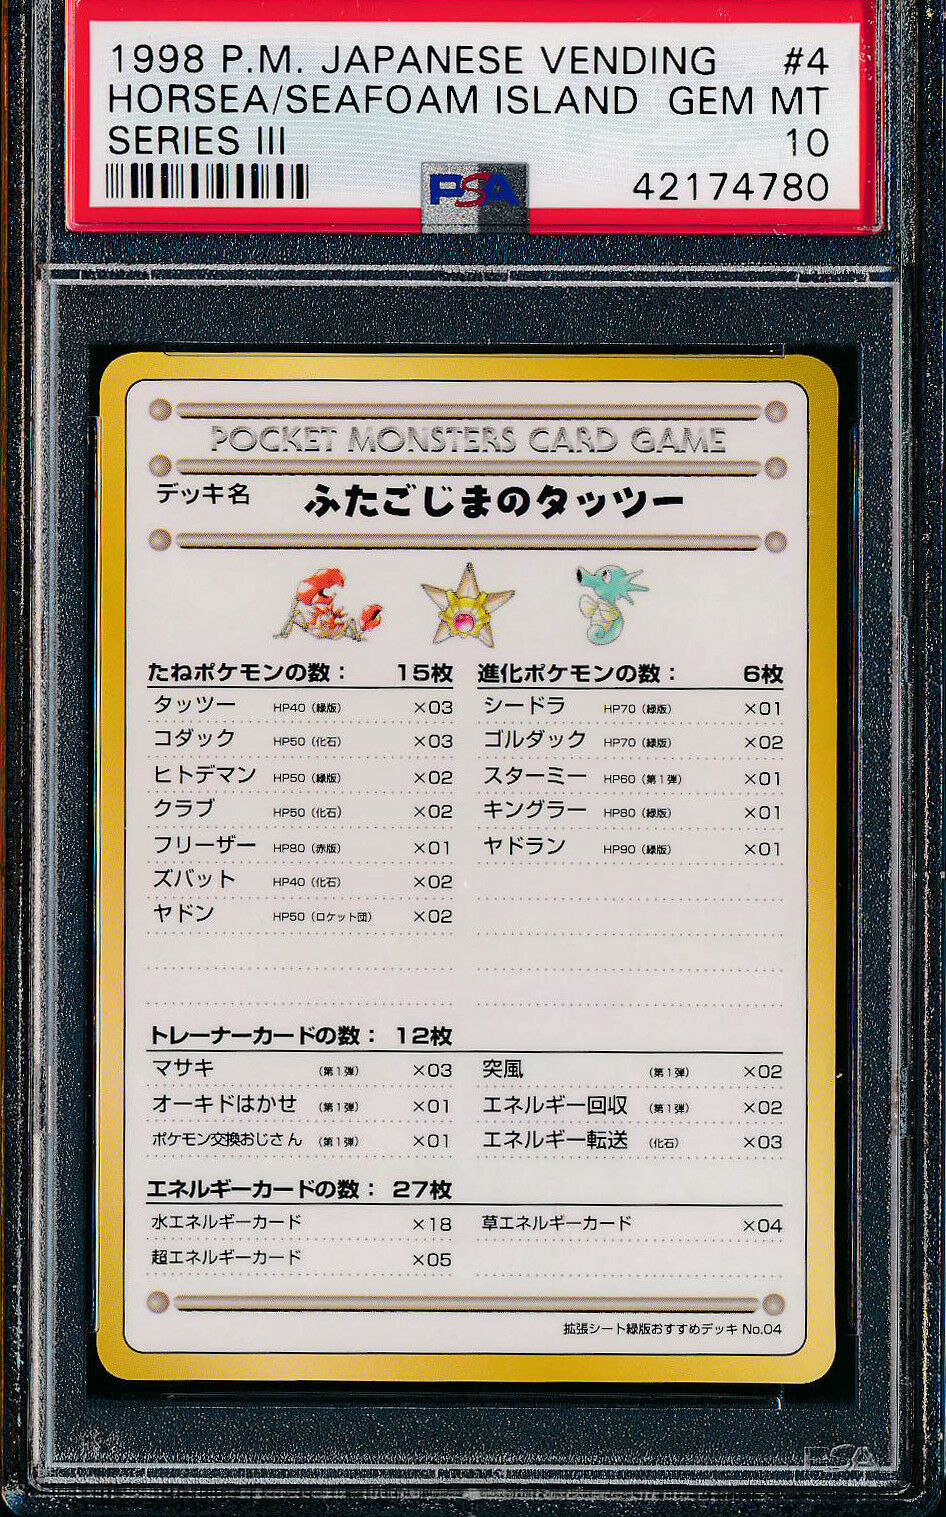 Pokemon PSA GEM MINT 10 Japanese Vending Series 3 III Horsea   Seafoam Island 4